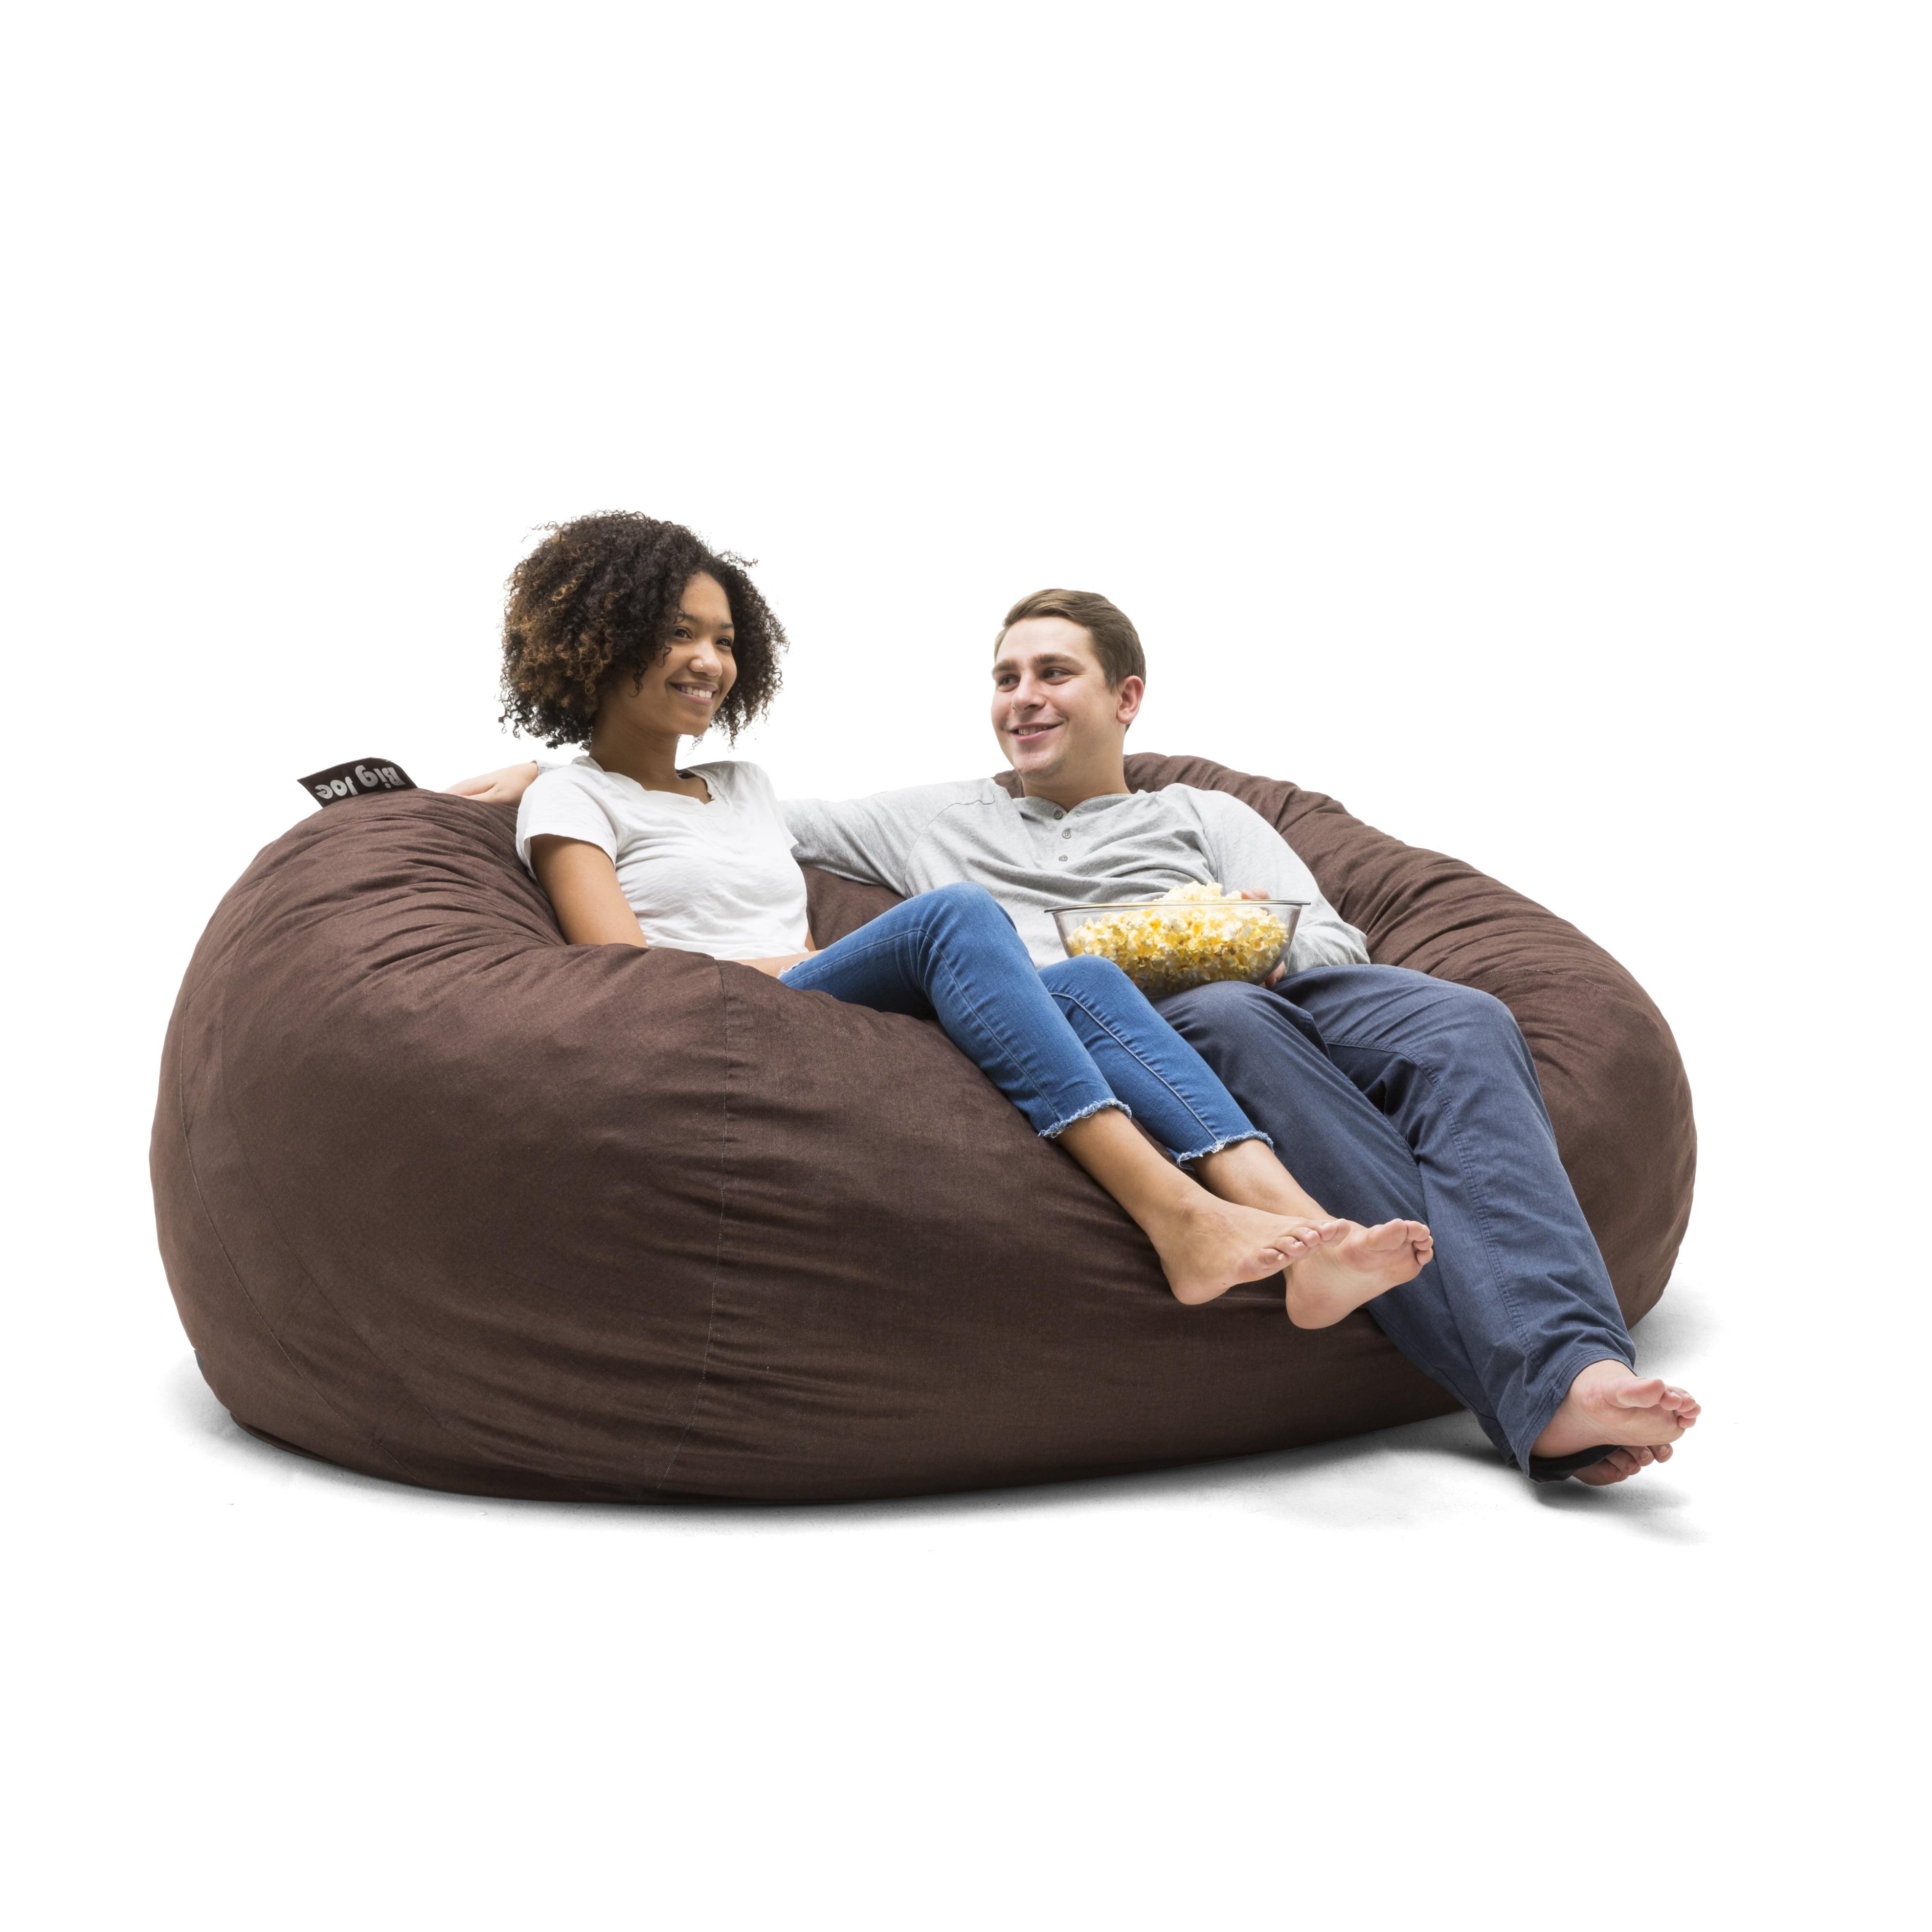 Big Joe Xxl 7 Fuf Bean Bag Chair Multiple Colors Fabrics